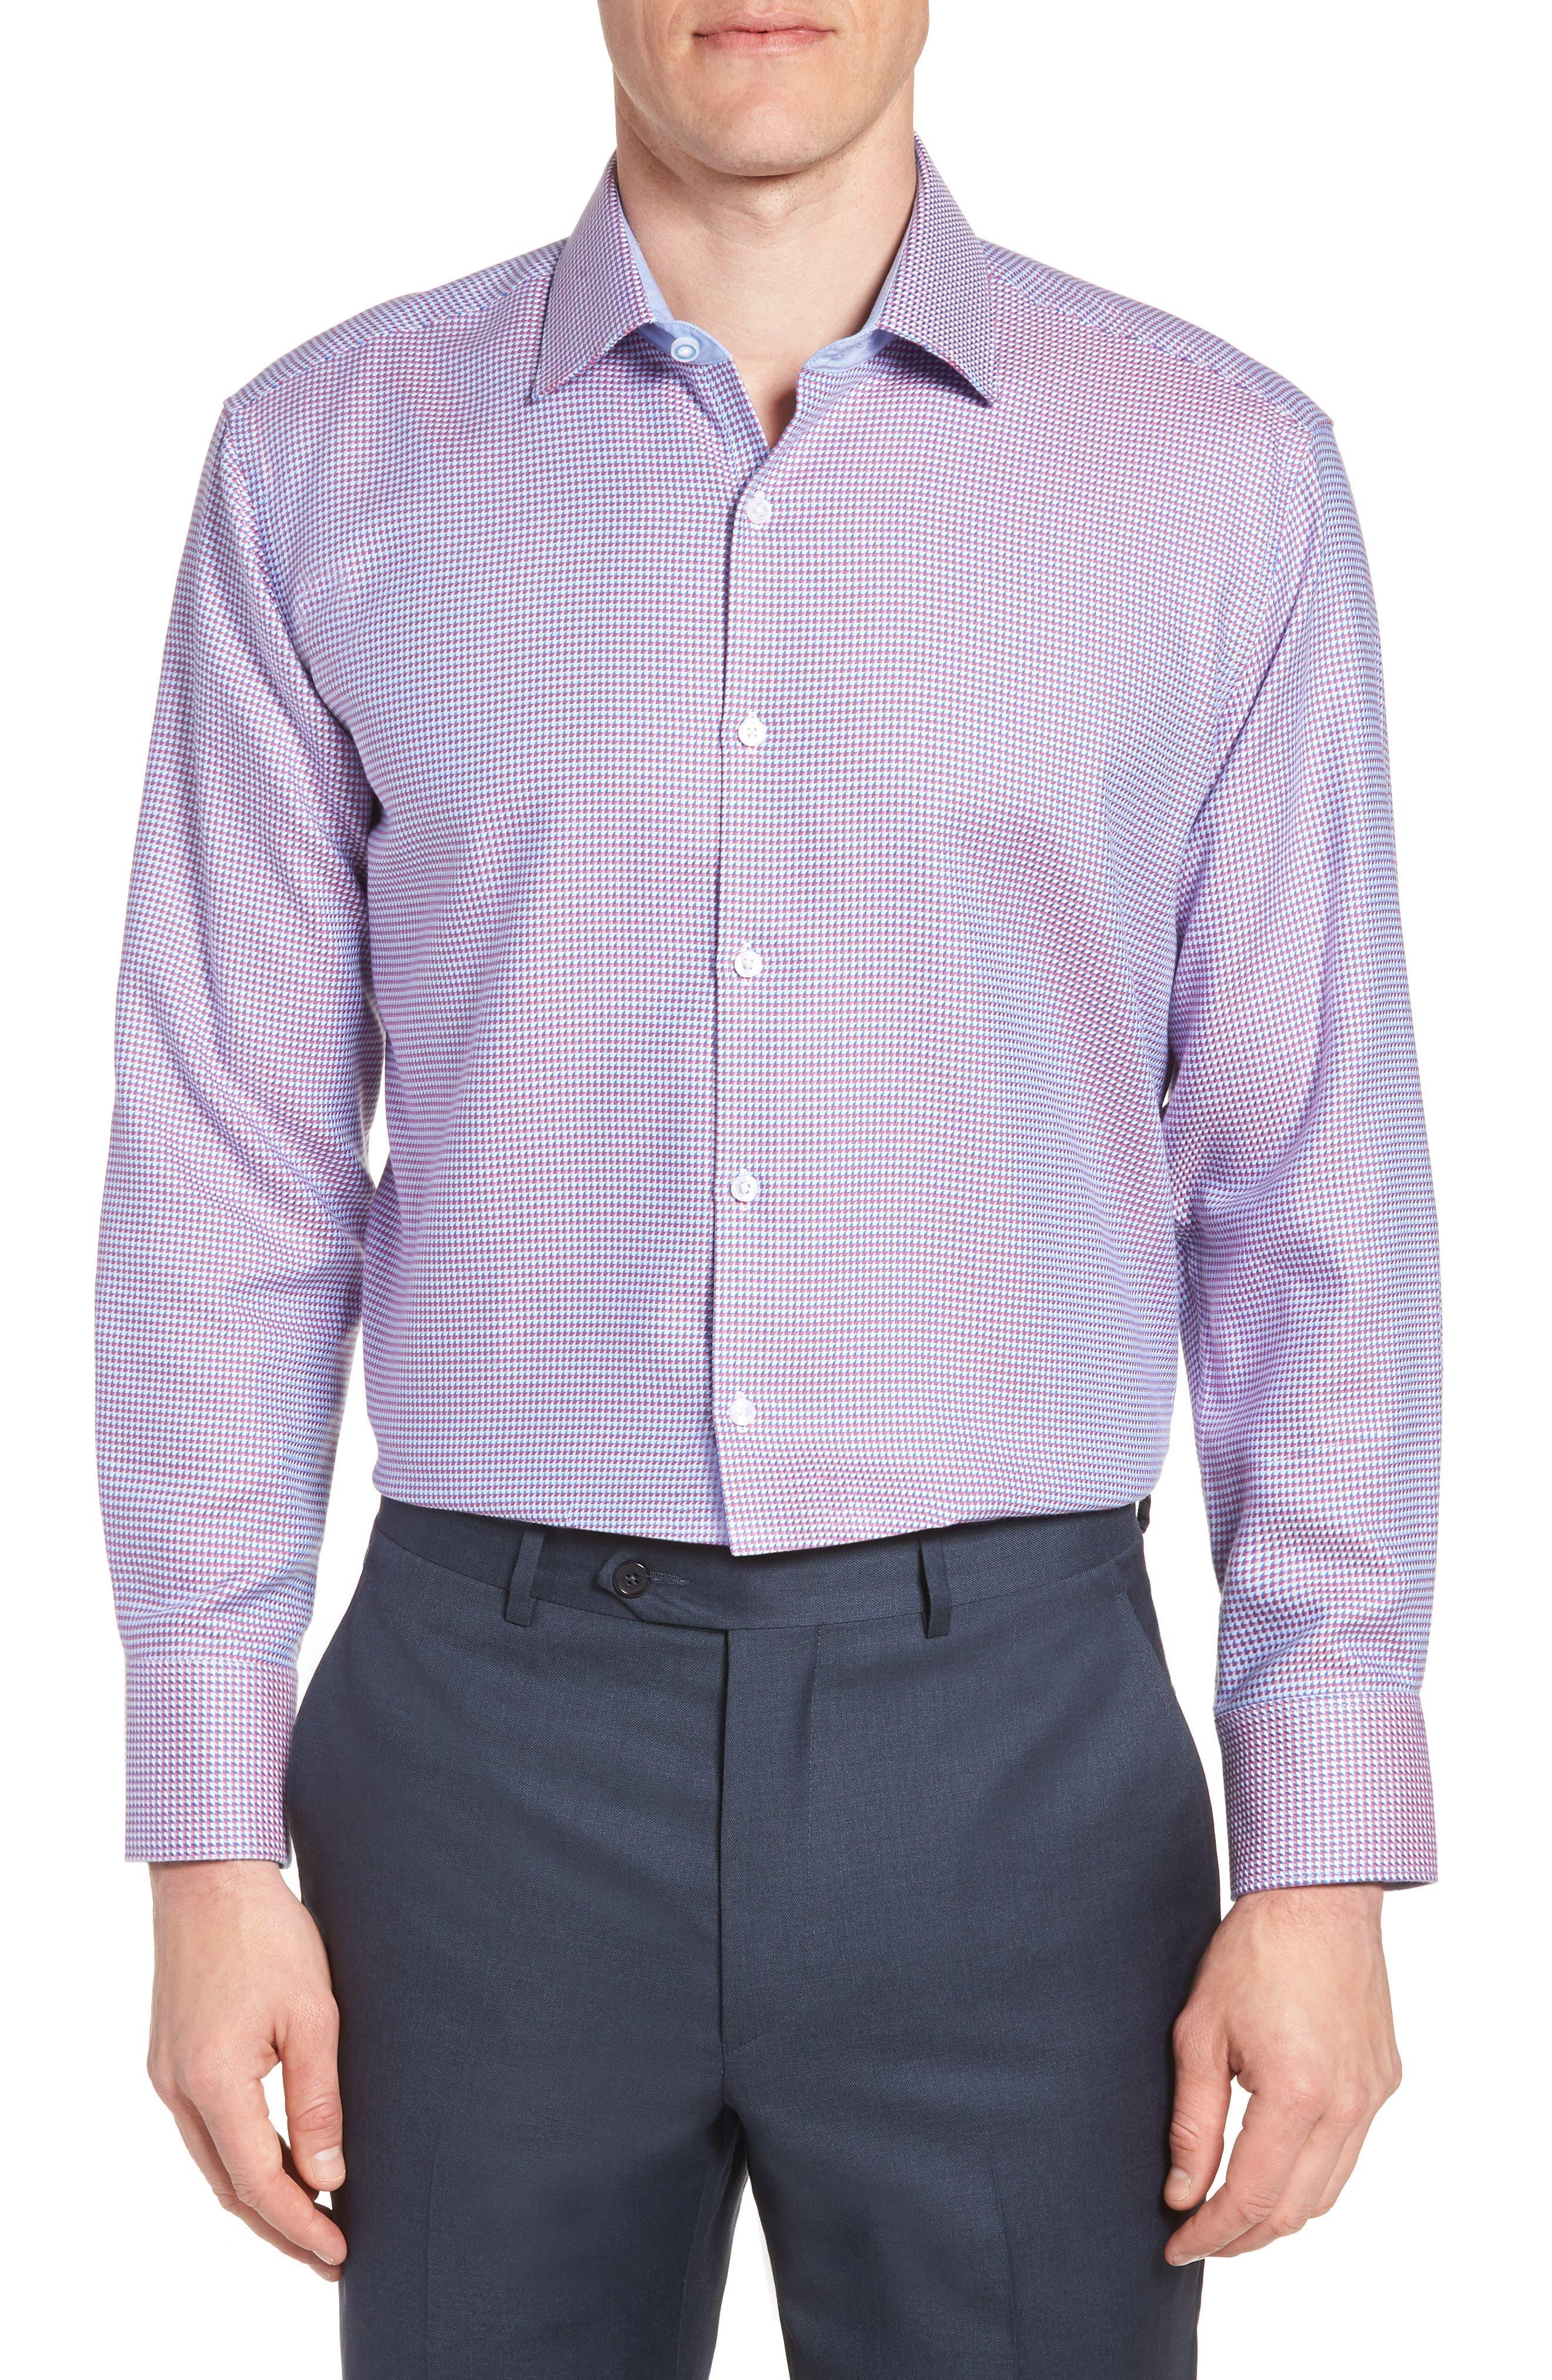 Axton Trim Fit Geometric Dress Shirt,                             Main thumbnail 1, color,                             Red/ Blue